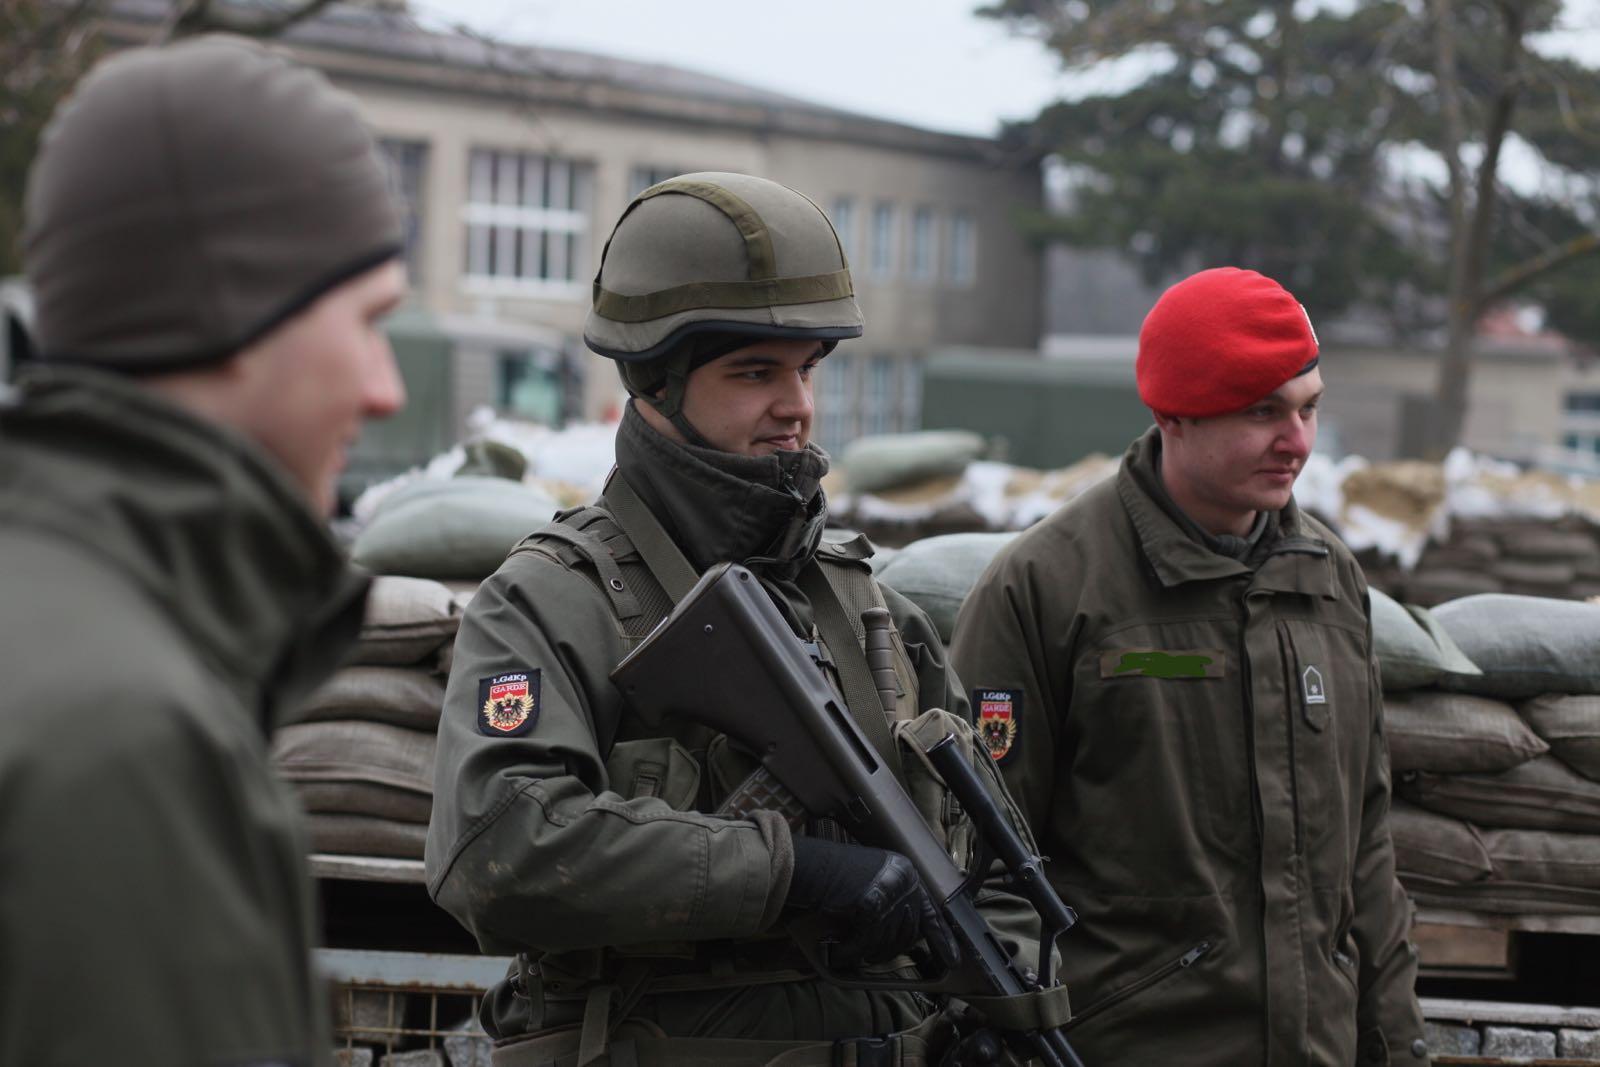 2019_02_06_1Gardekompanie_AssE_Checkpoint - 3 of 10